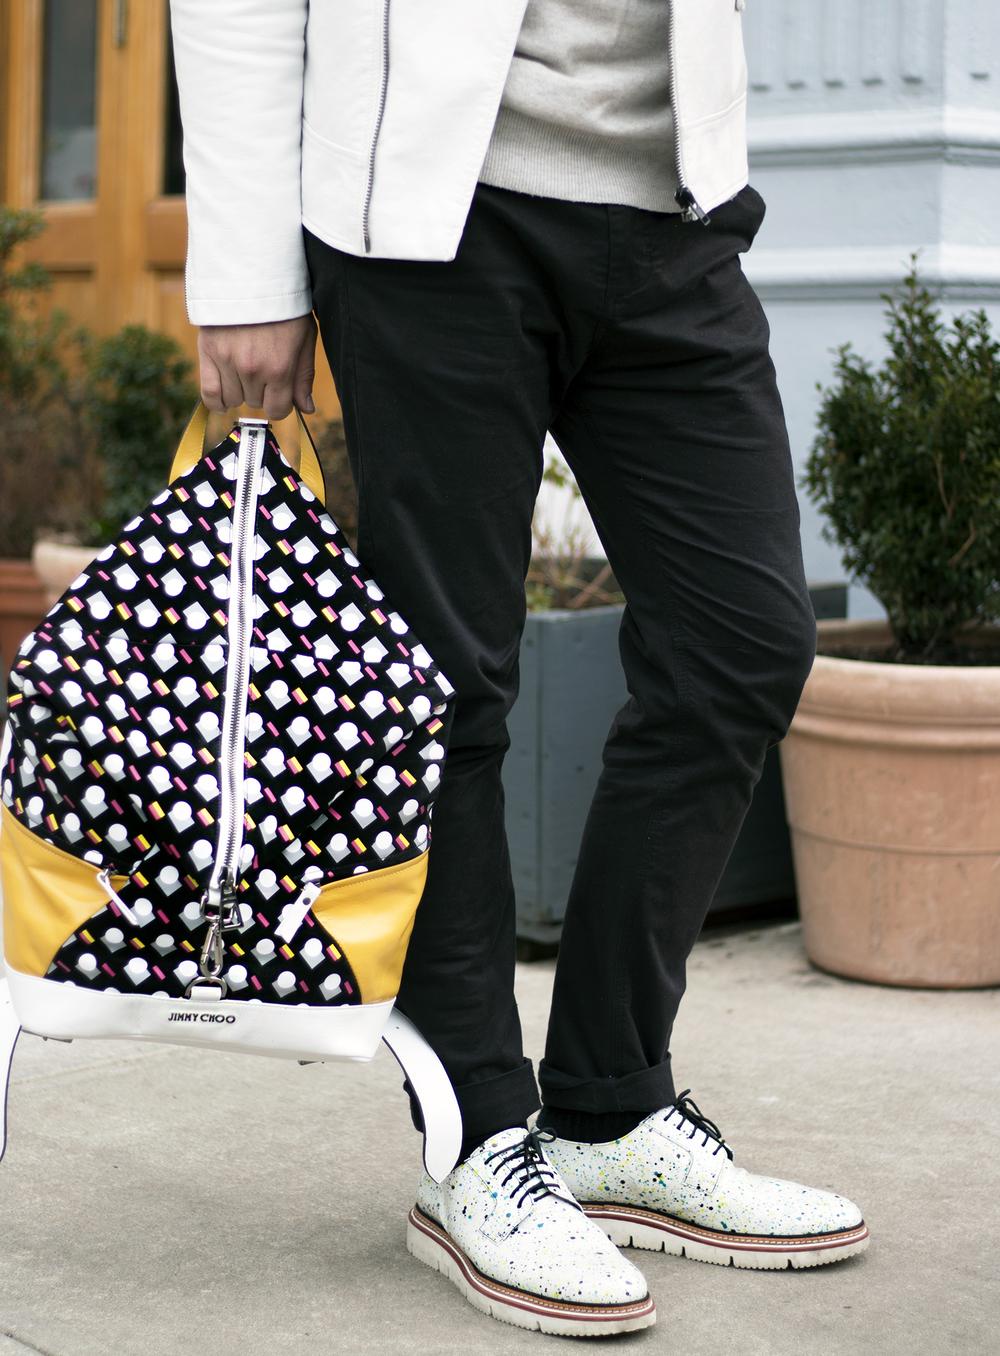 Jimmy Choo Backpack and Shoes